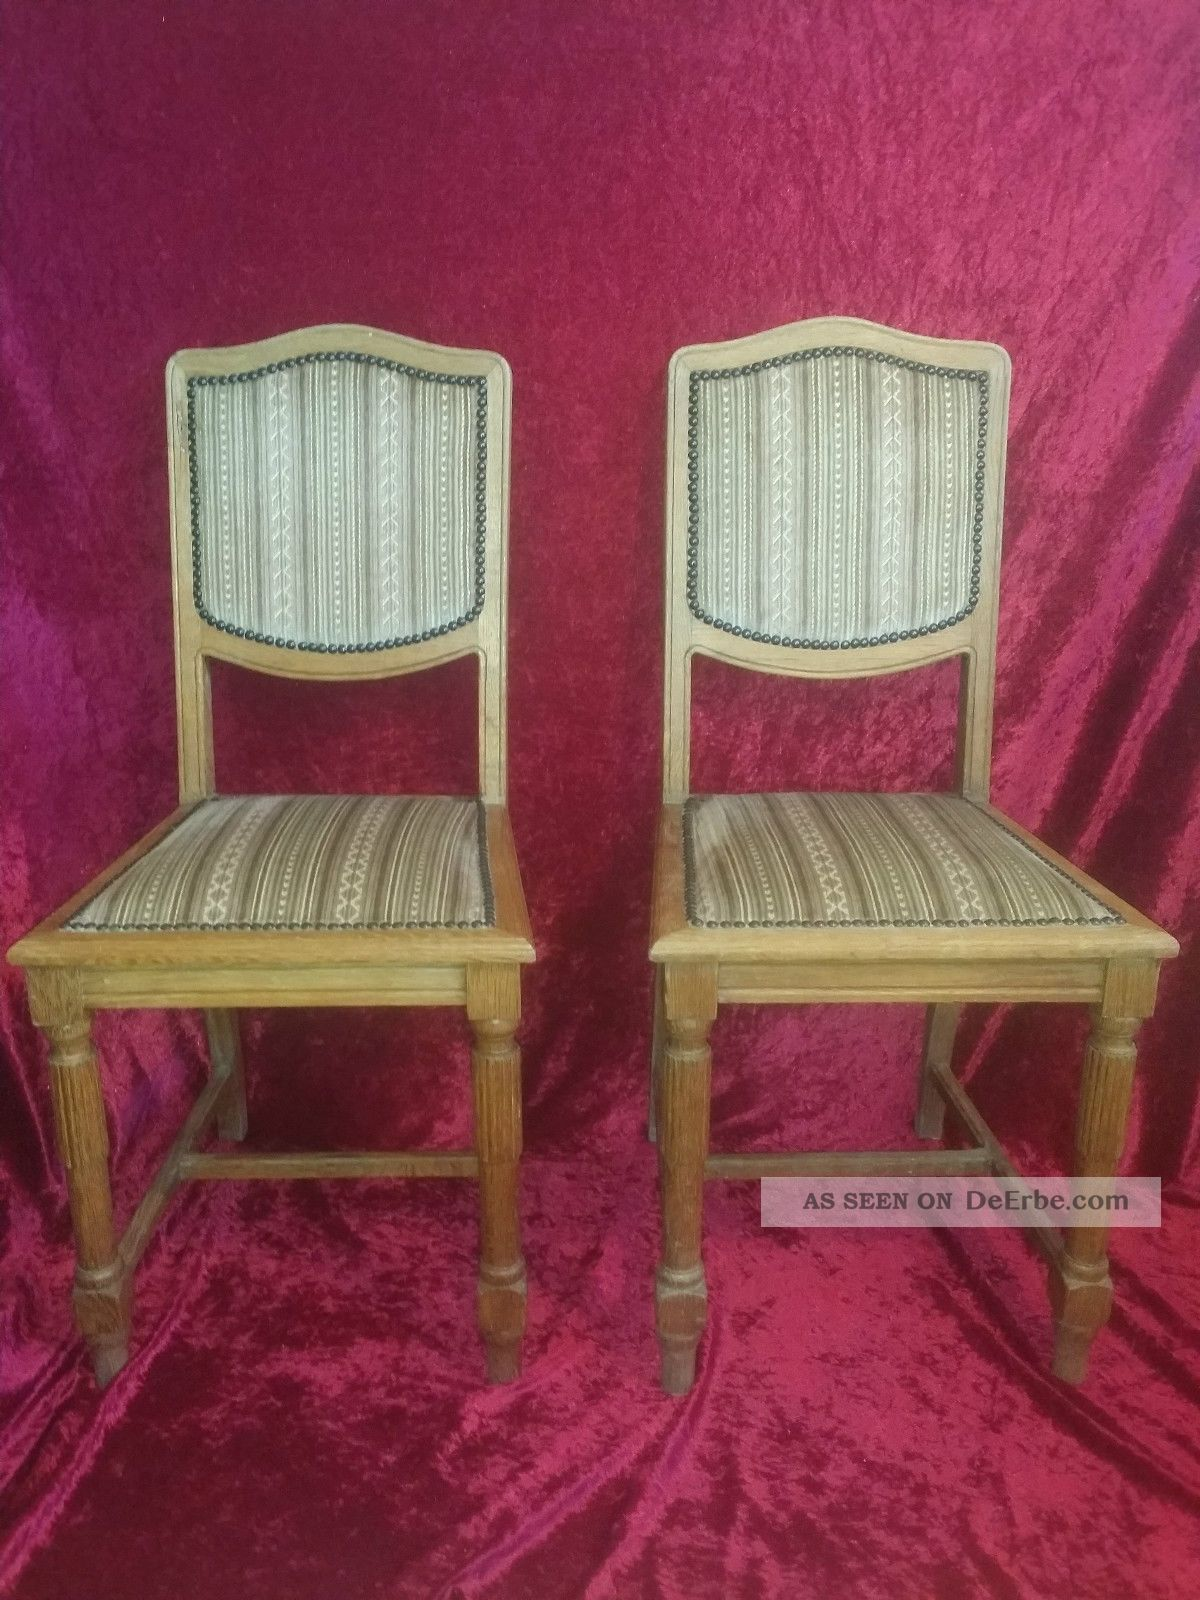 2x Jugendstil Stühle Eiche Um 1910/20 Antik Stuhl Antike Bild